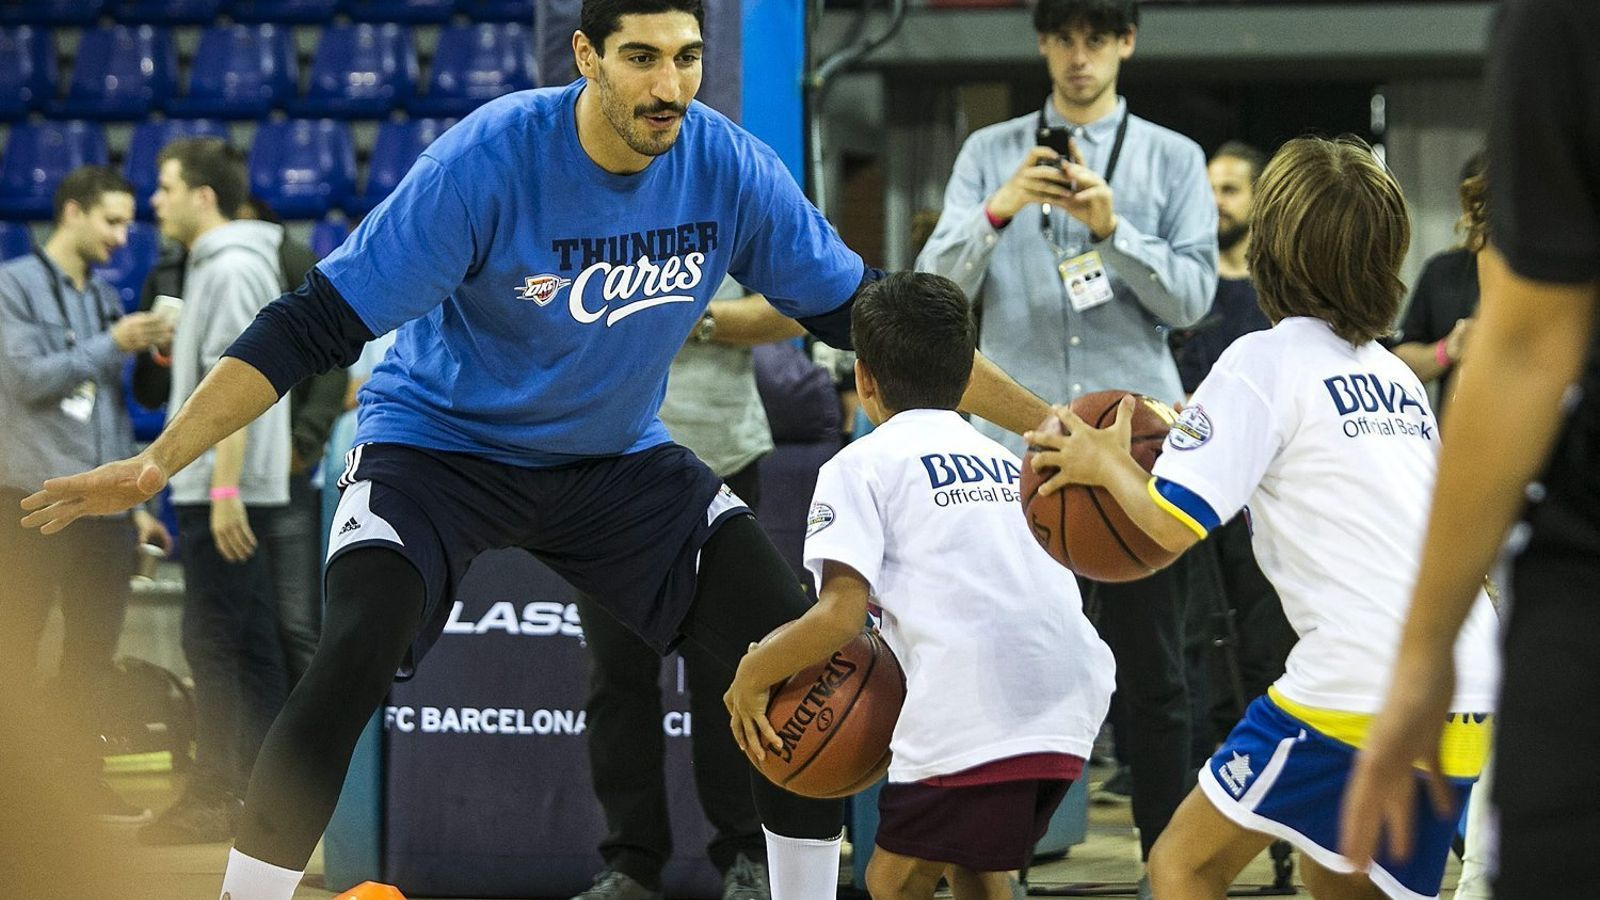 Armario Branco Pequeno ~ L u2019espectacle de la NBA aterra a Barcelona ( u00c0lex Gozalbo)